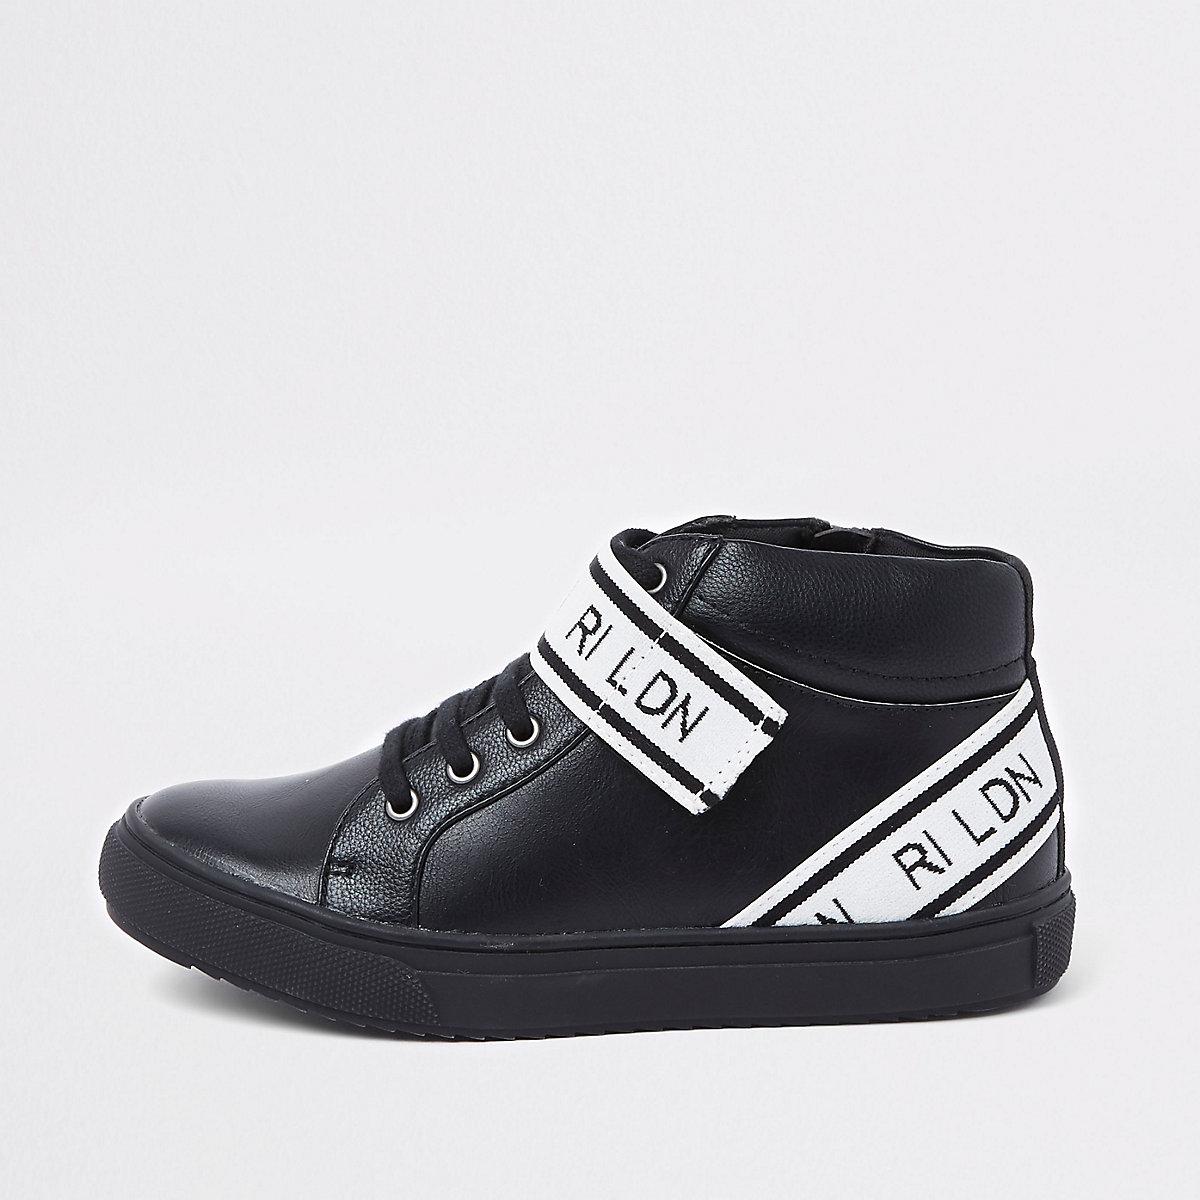 Boys black 'RI LDN' strap high top trainers